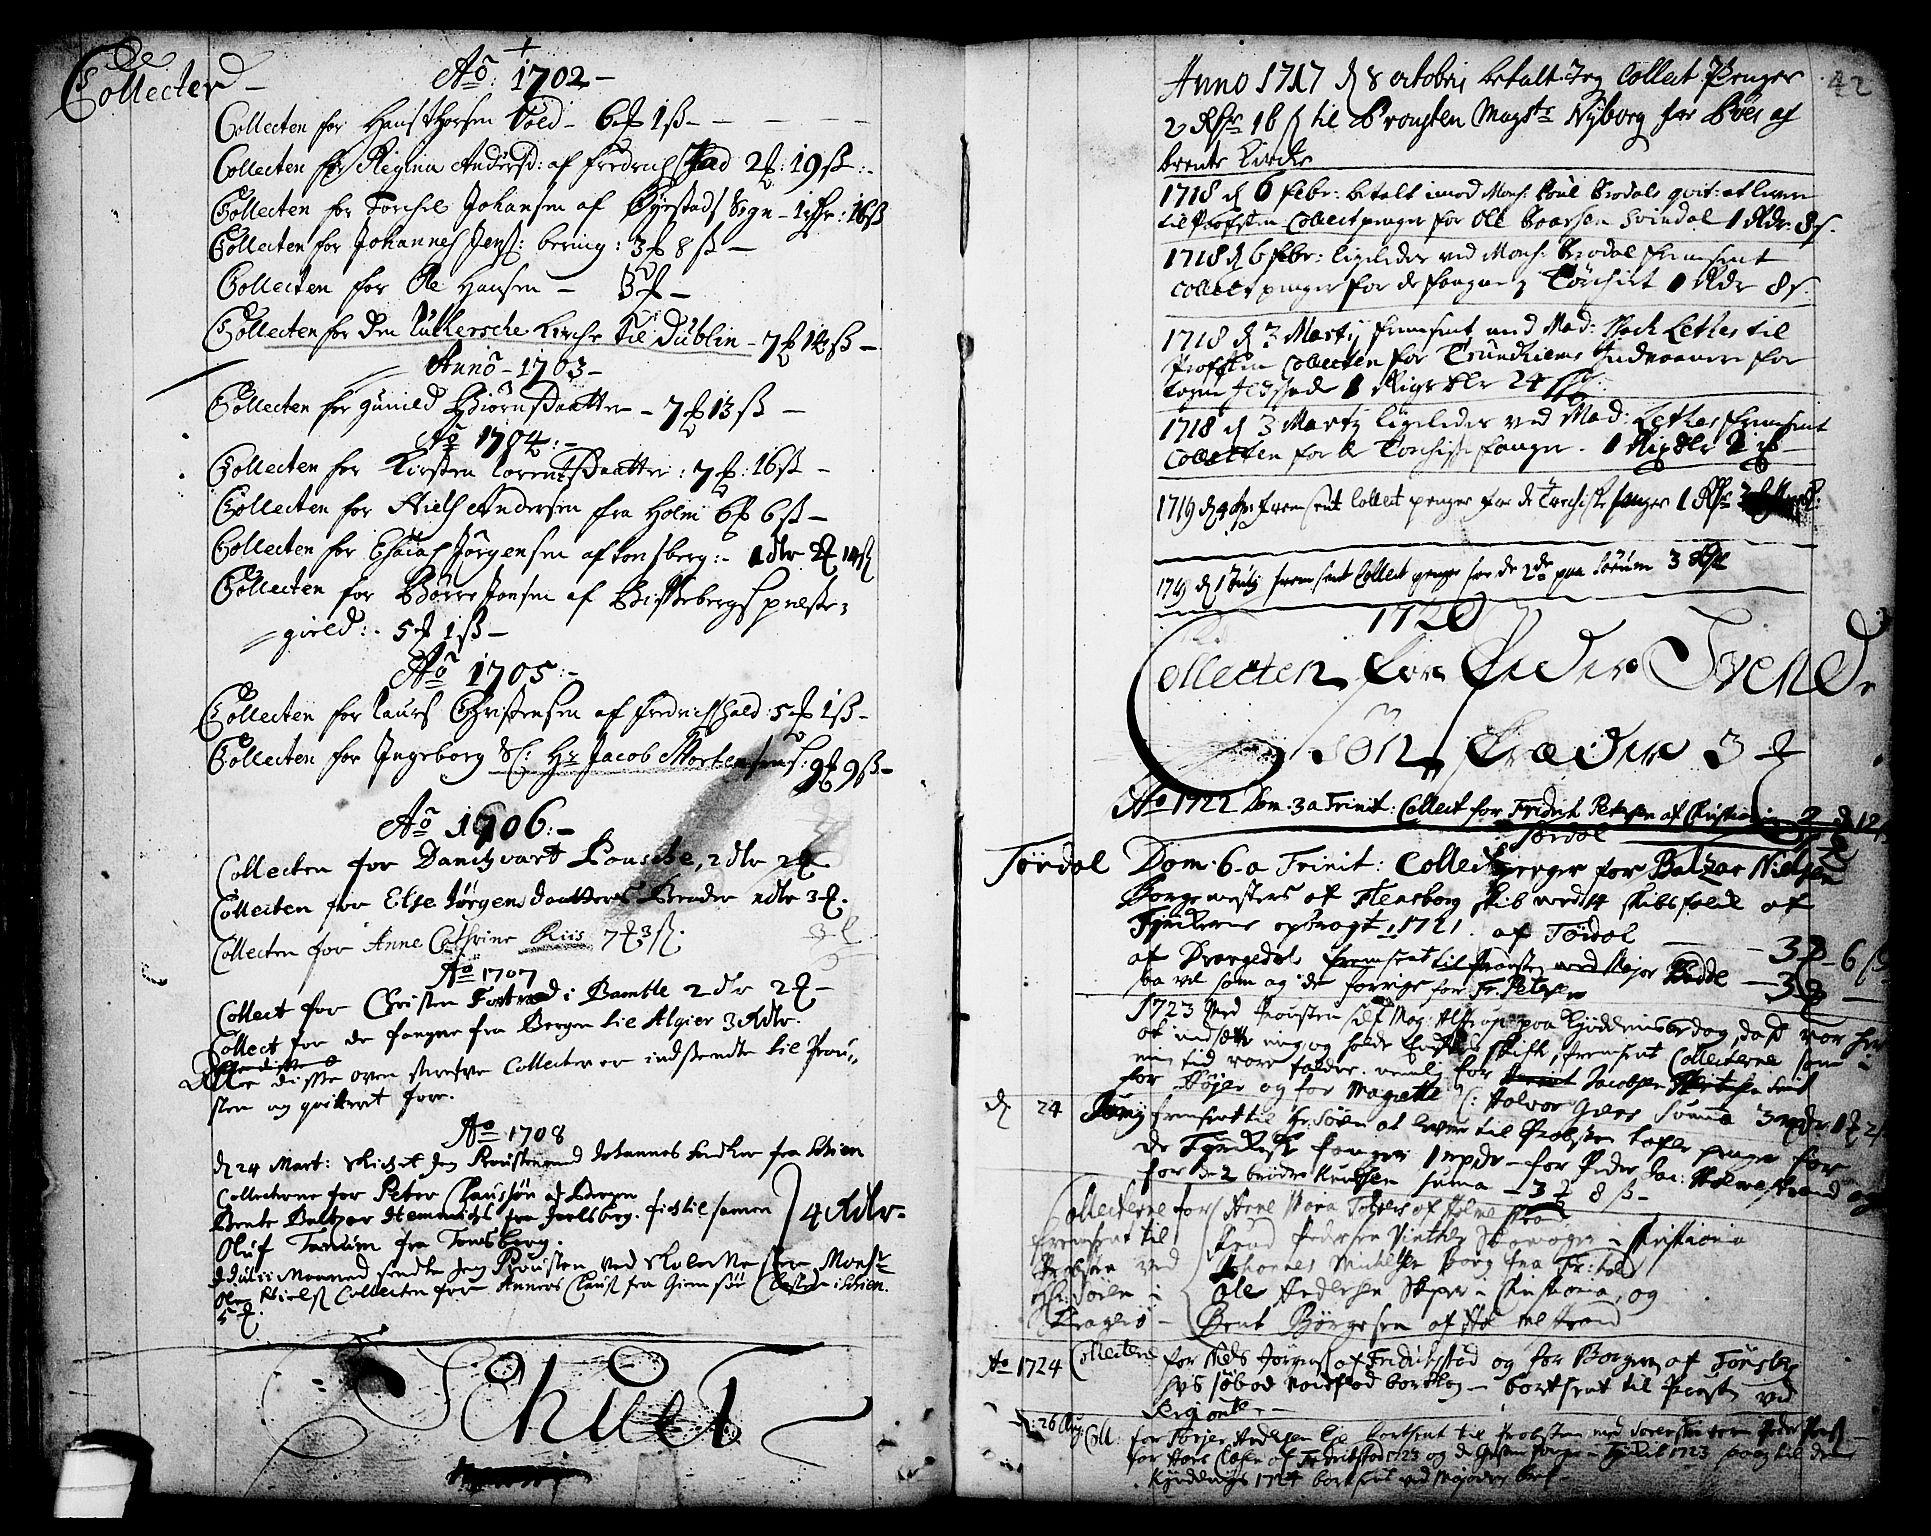 SAKO, Drangedal kirkebøker, F/Fa/L0001: Ministerialbok nr. 1, 1697-1767, s. 42